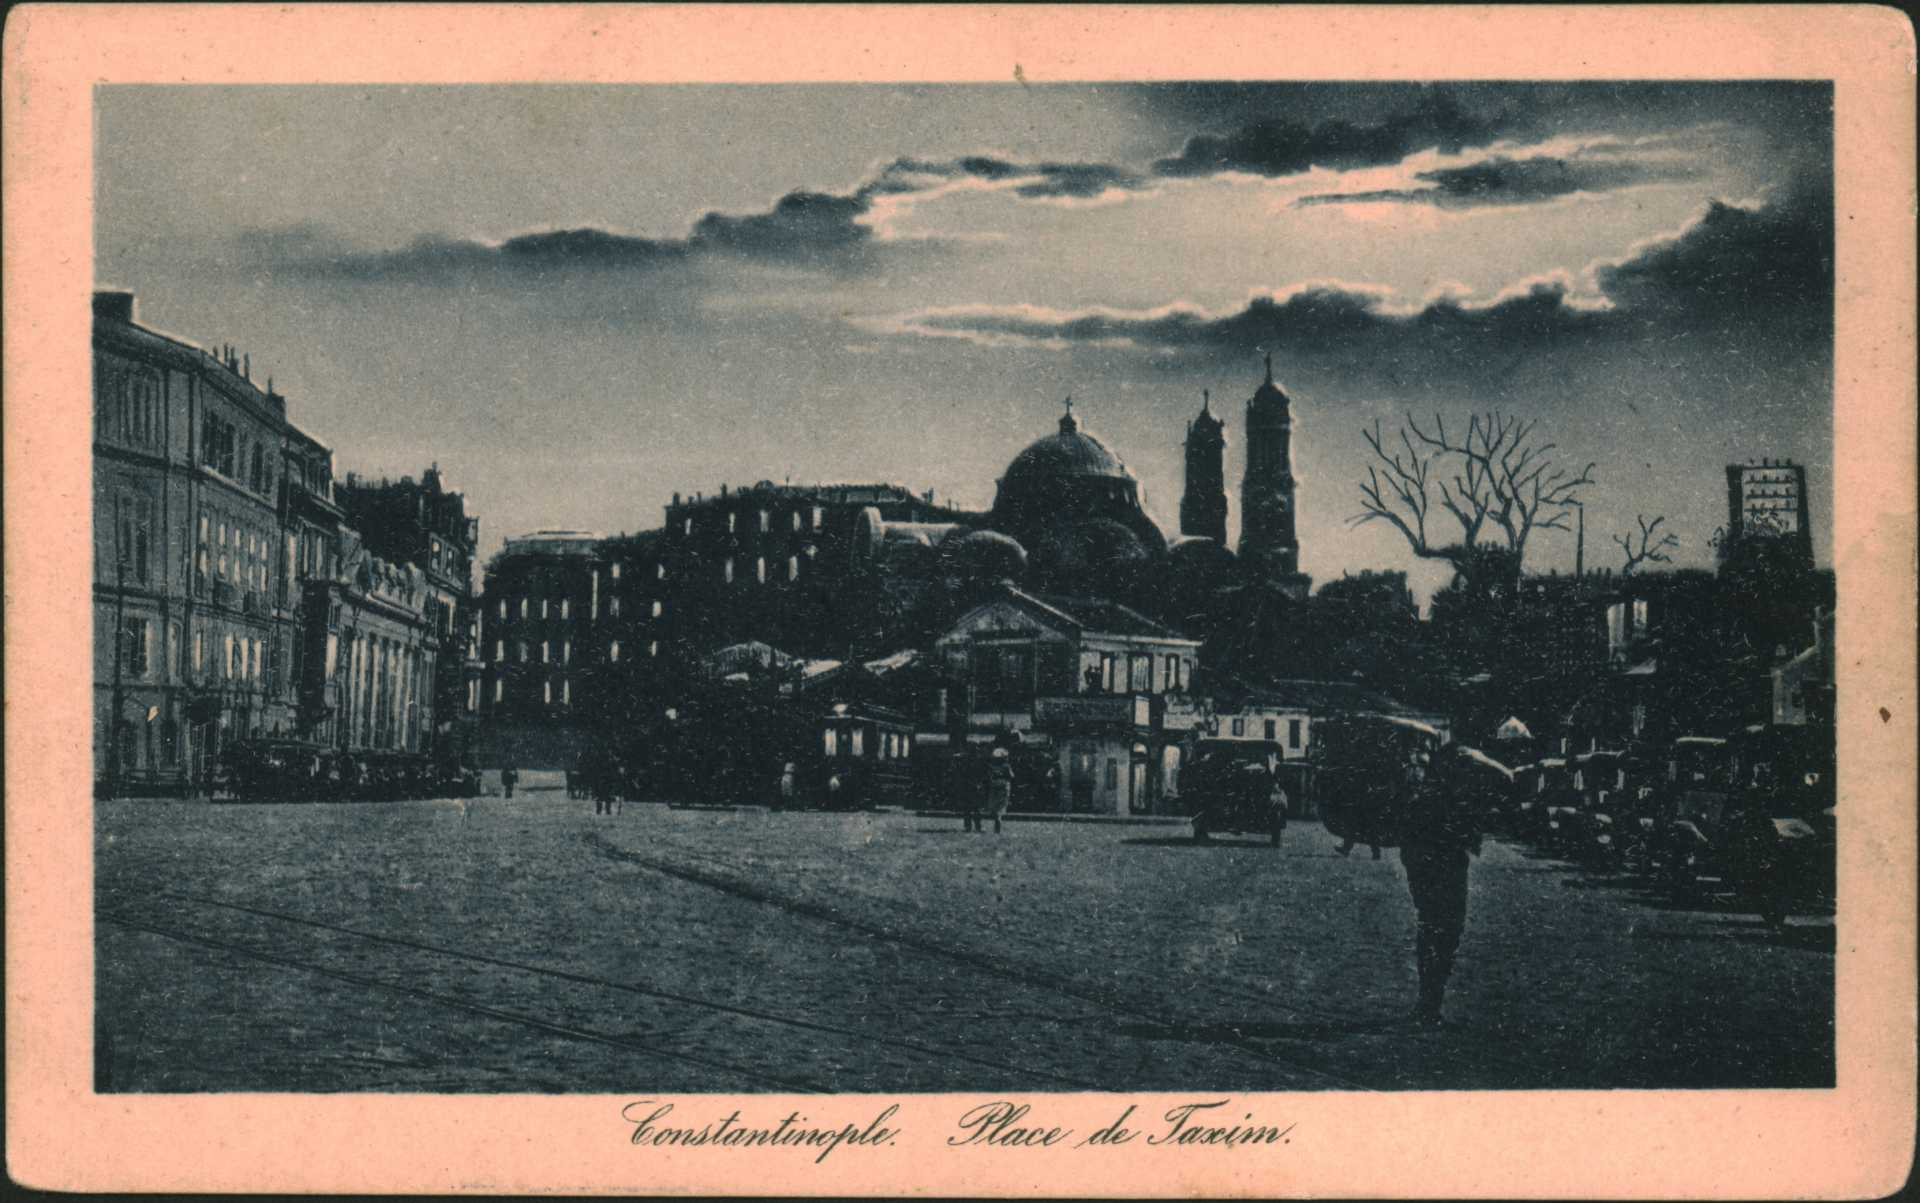 Constantinople- Place de Taxim